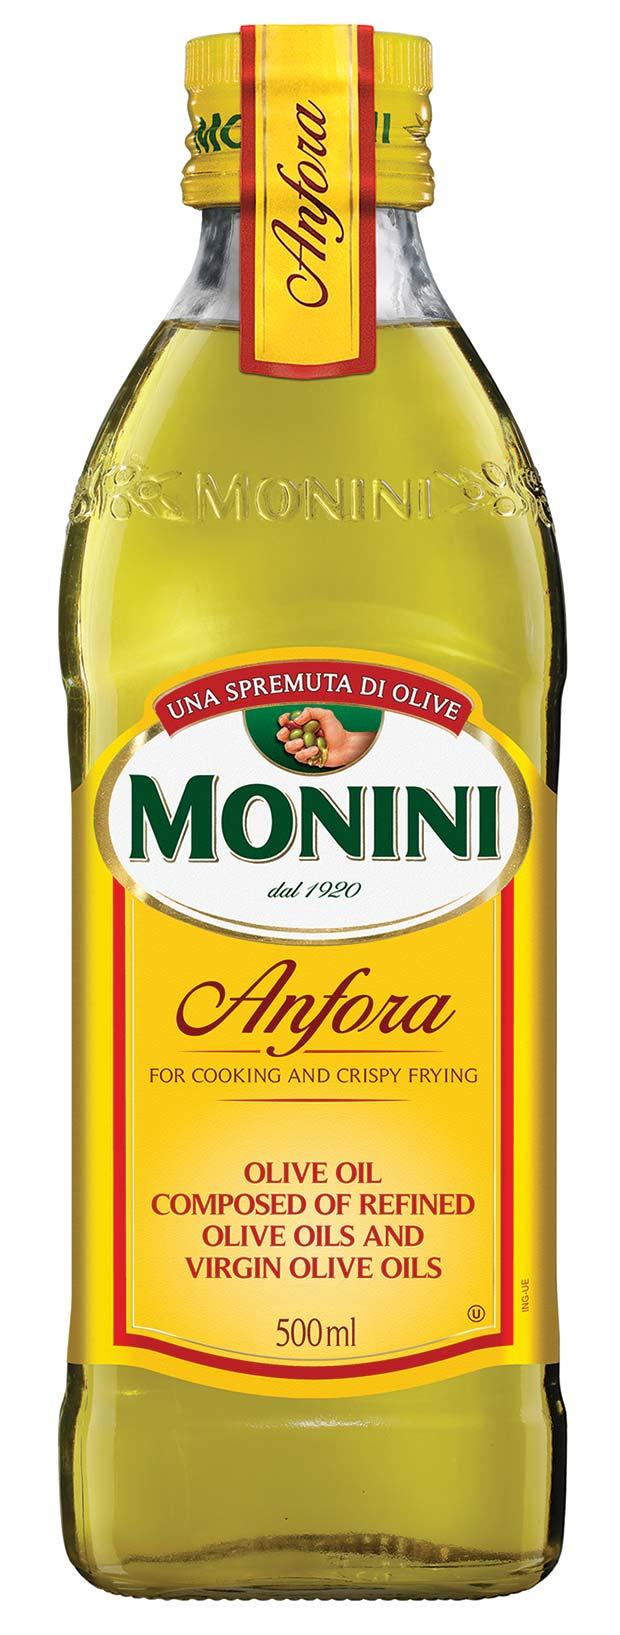 MN010-Olive-Oil-500ml